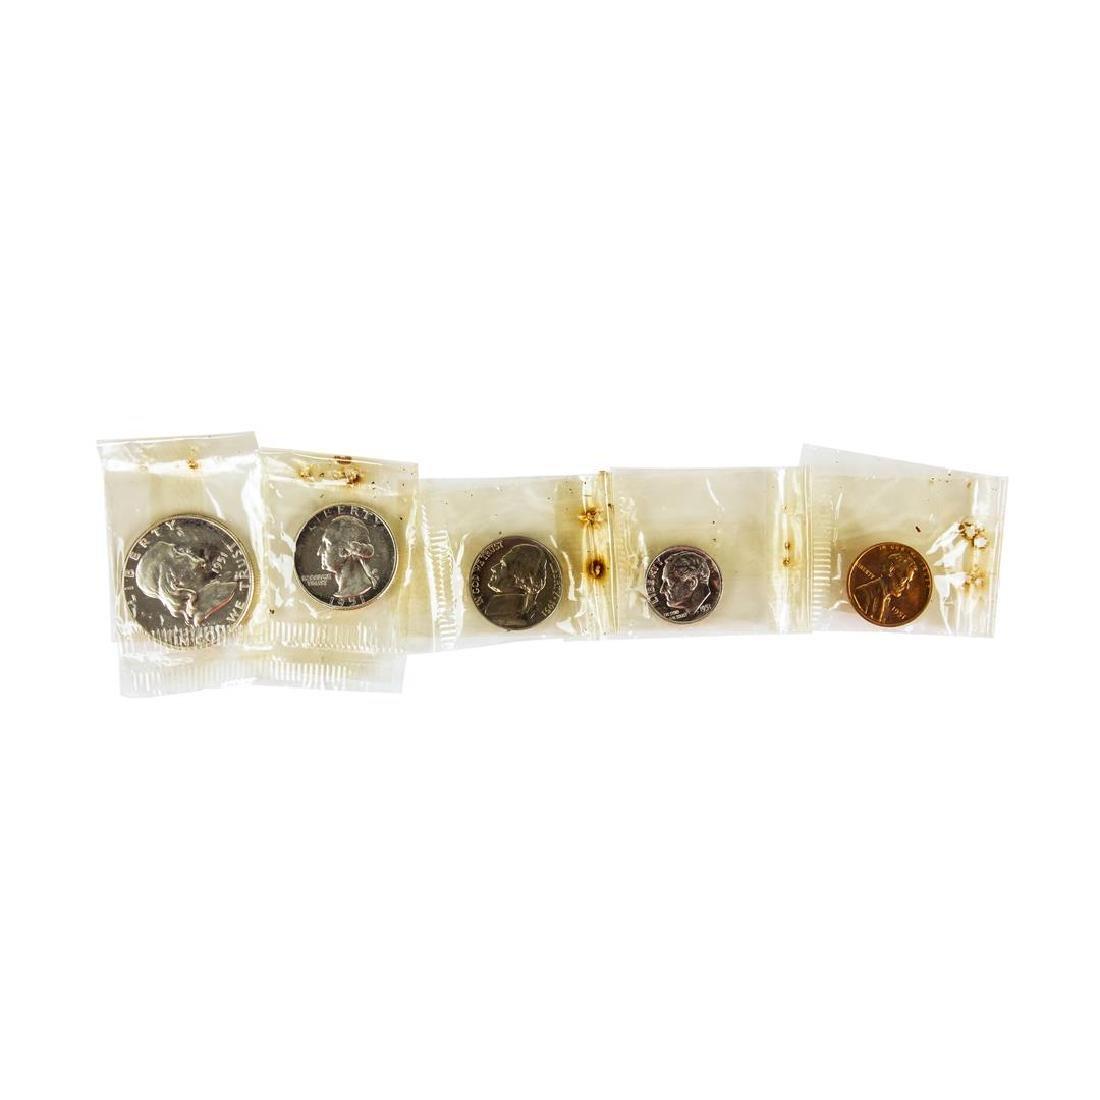 1951 (5) Coin Proof Set in Original Box